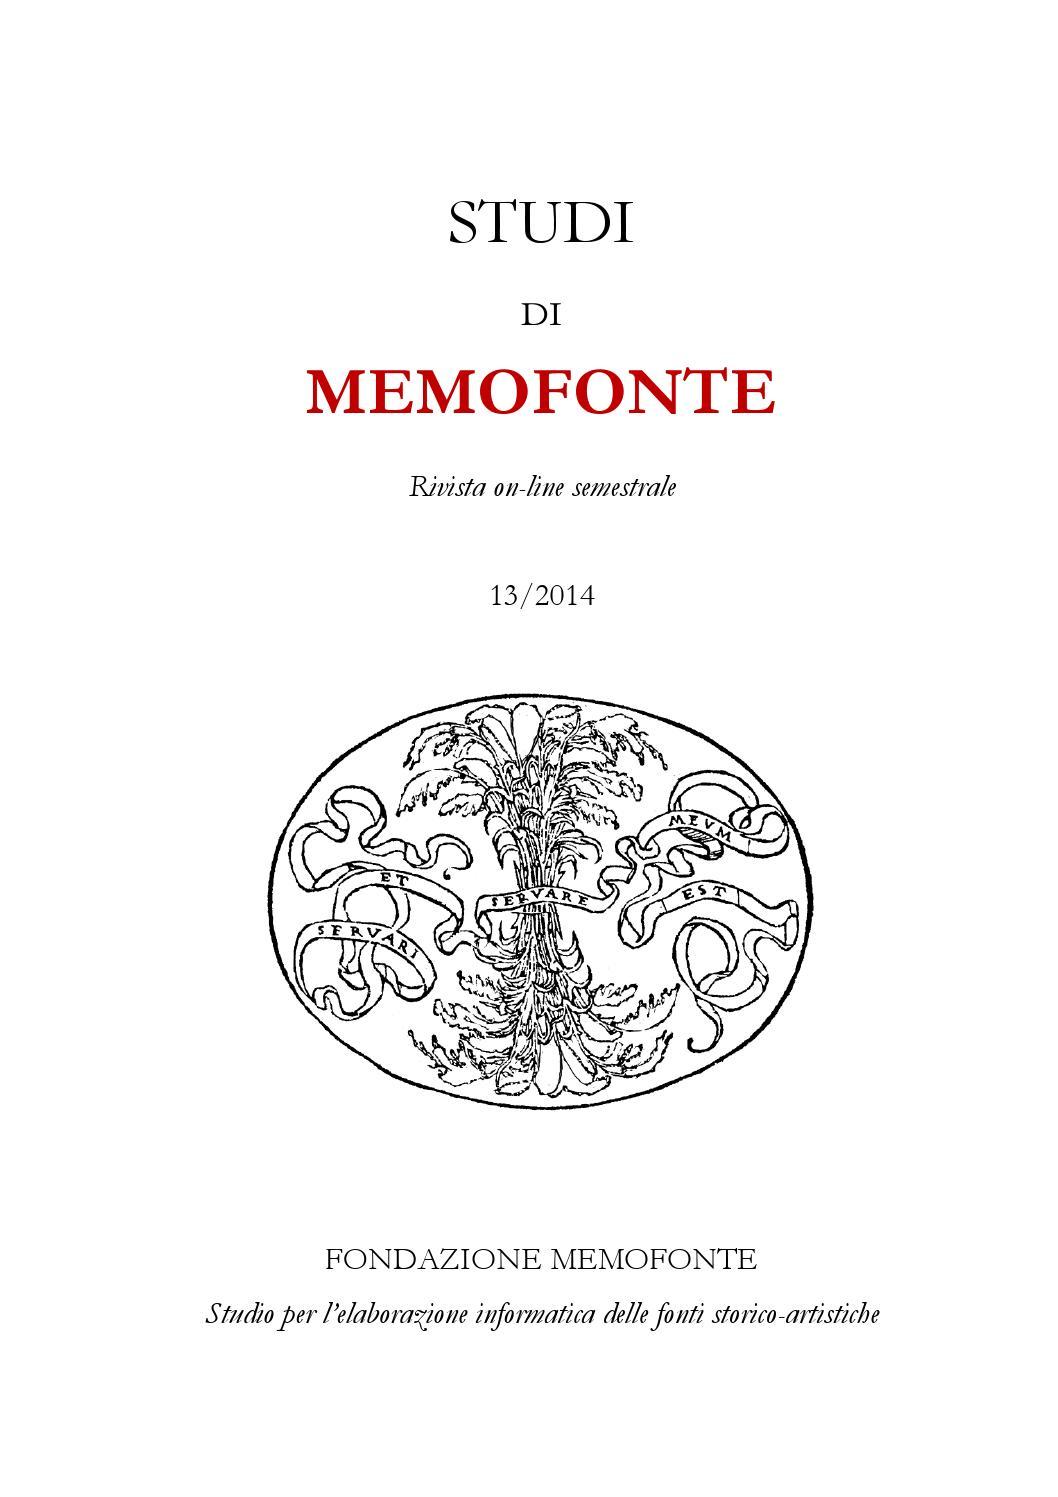 XIII 2014 STUDI DI MEMOFONTE by Fondazione Memofonte Onlus - issuu f1883a1e73b